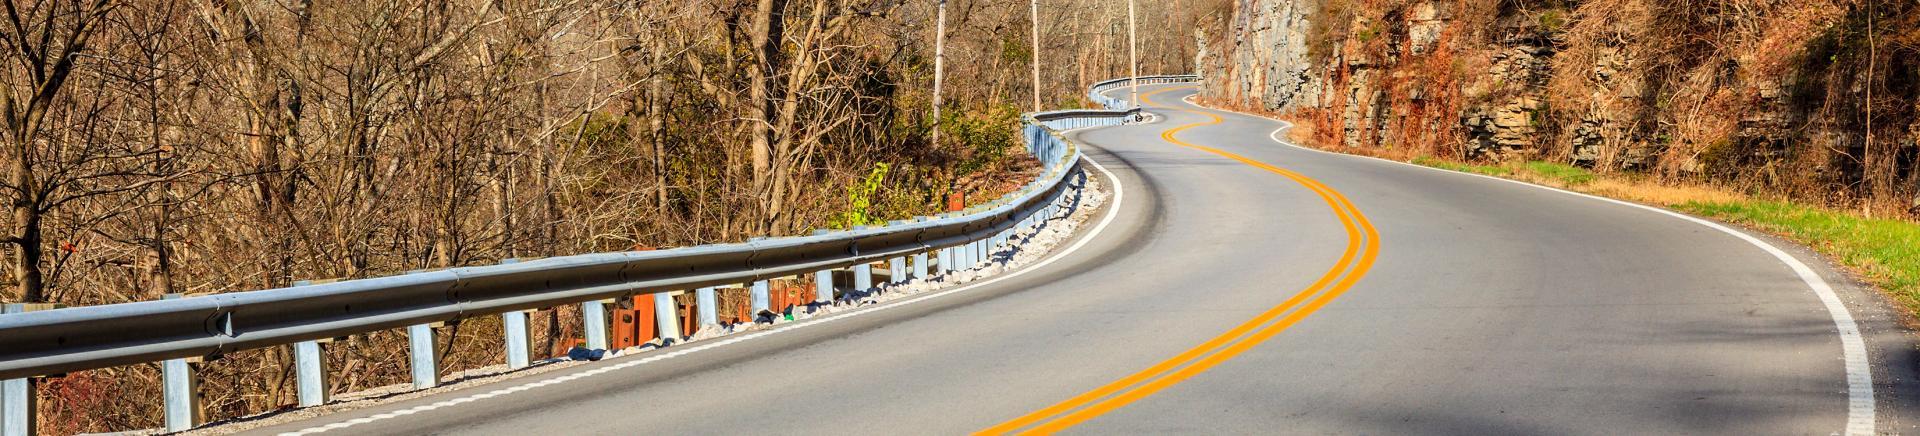 Roadside Safety Improvements for Rural Roads